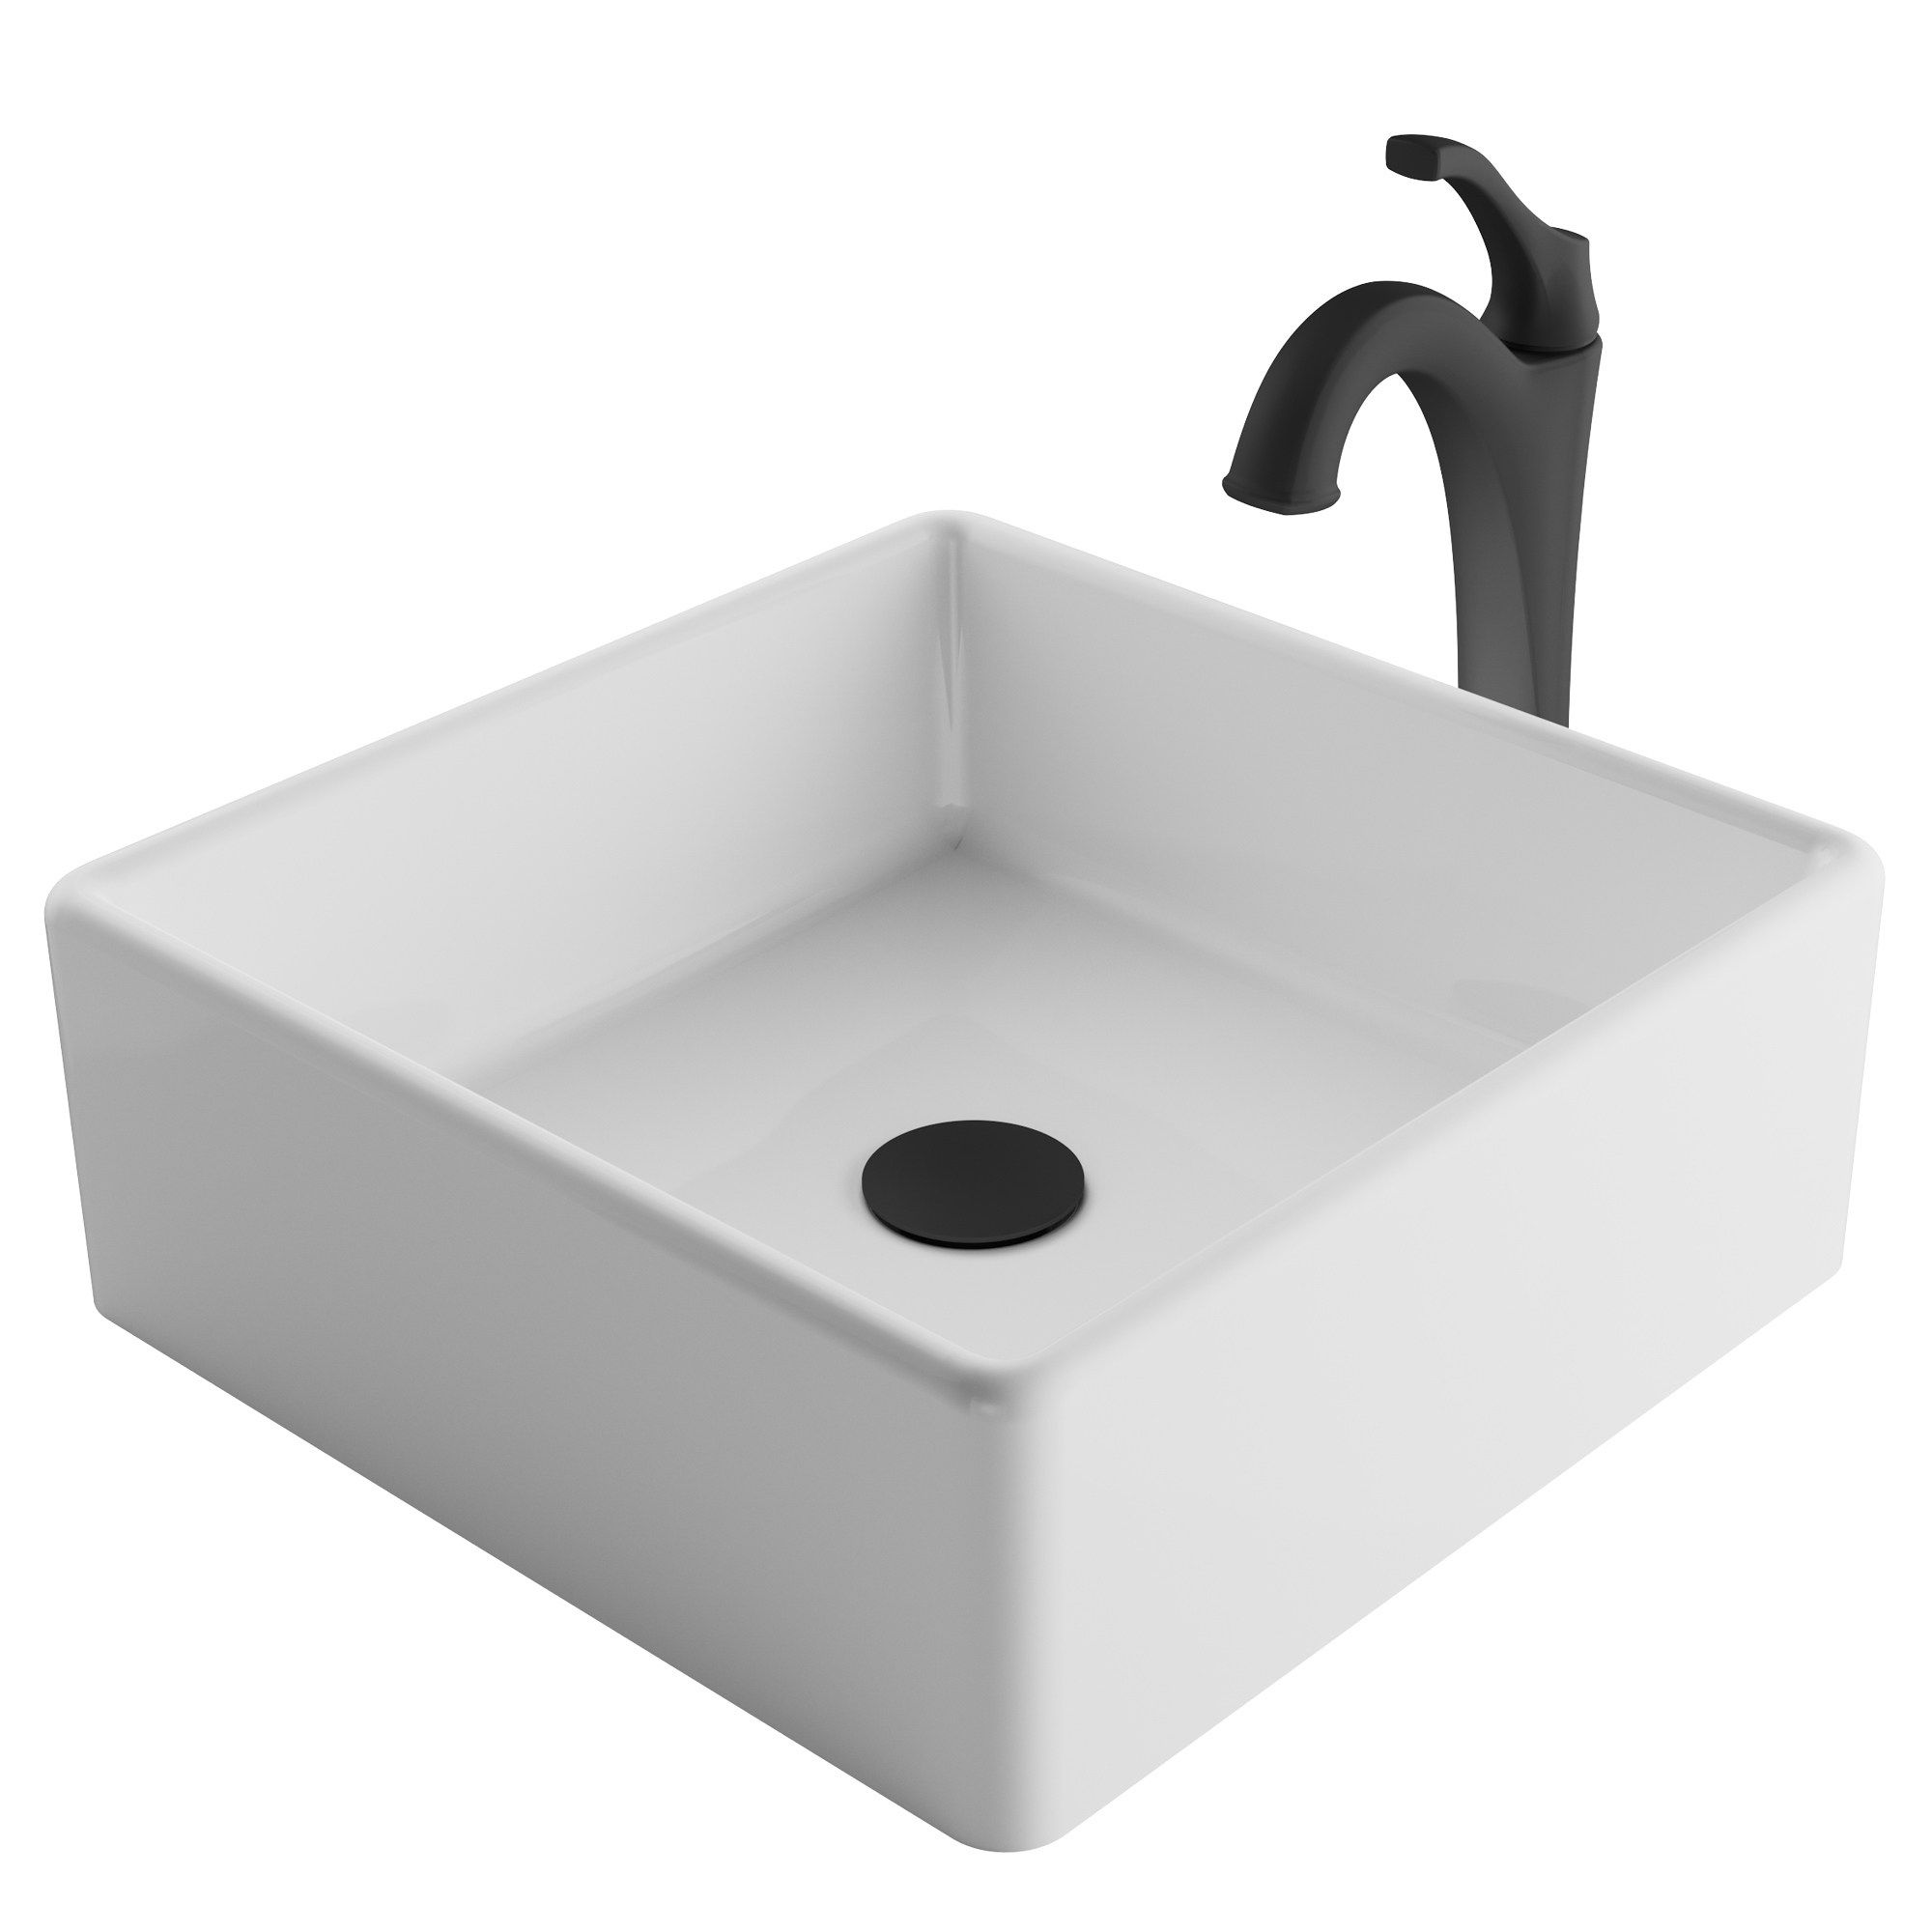 Kraus 3 In 1 Bathroom Set C Kcv 120 1200 White Ceramic Square